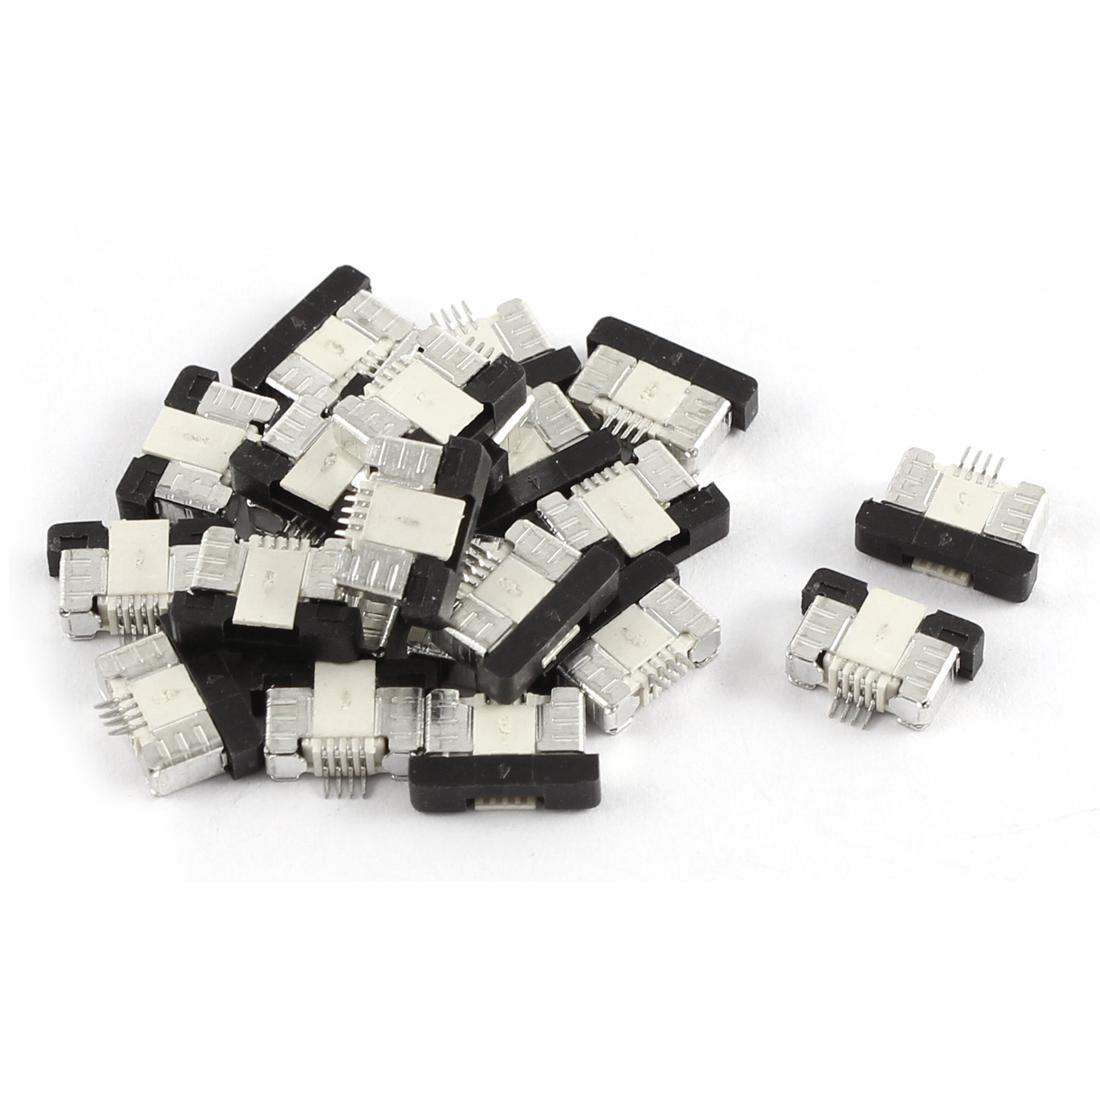 20Pcs Bottom Port 4Pin 0.5mm Pitch FFC FPC Ribbon Sockets Connector